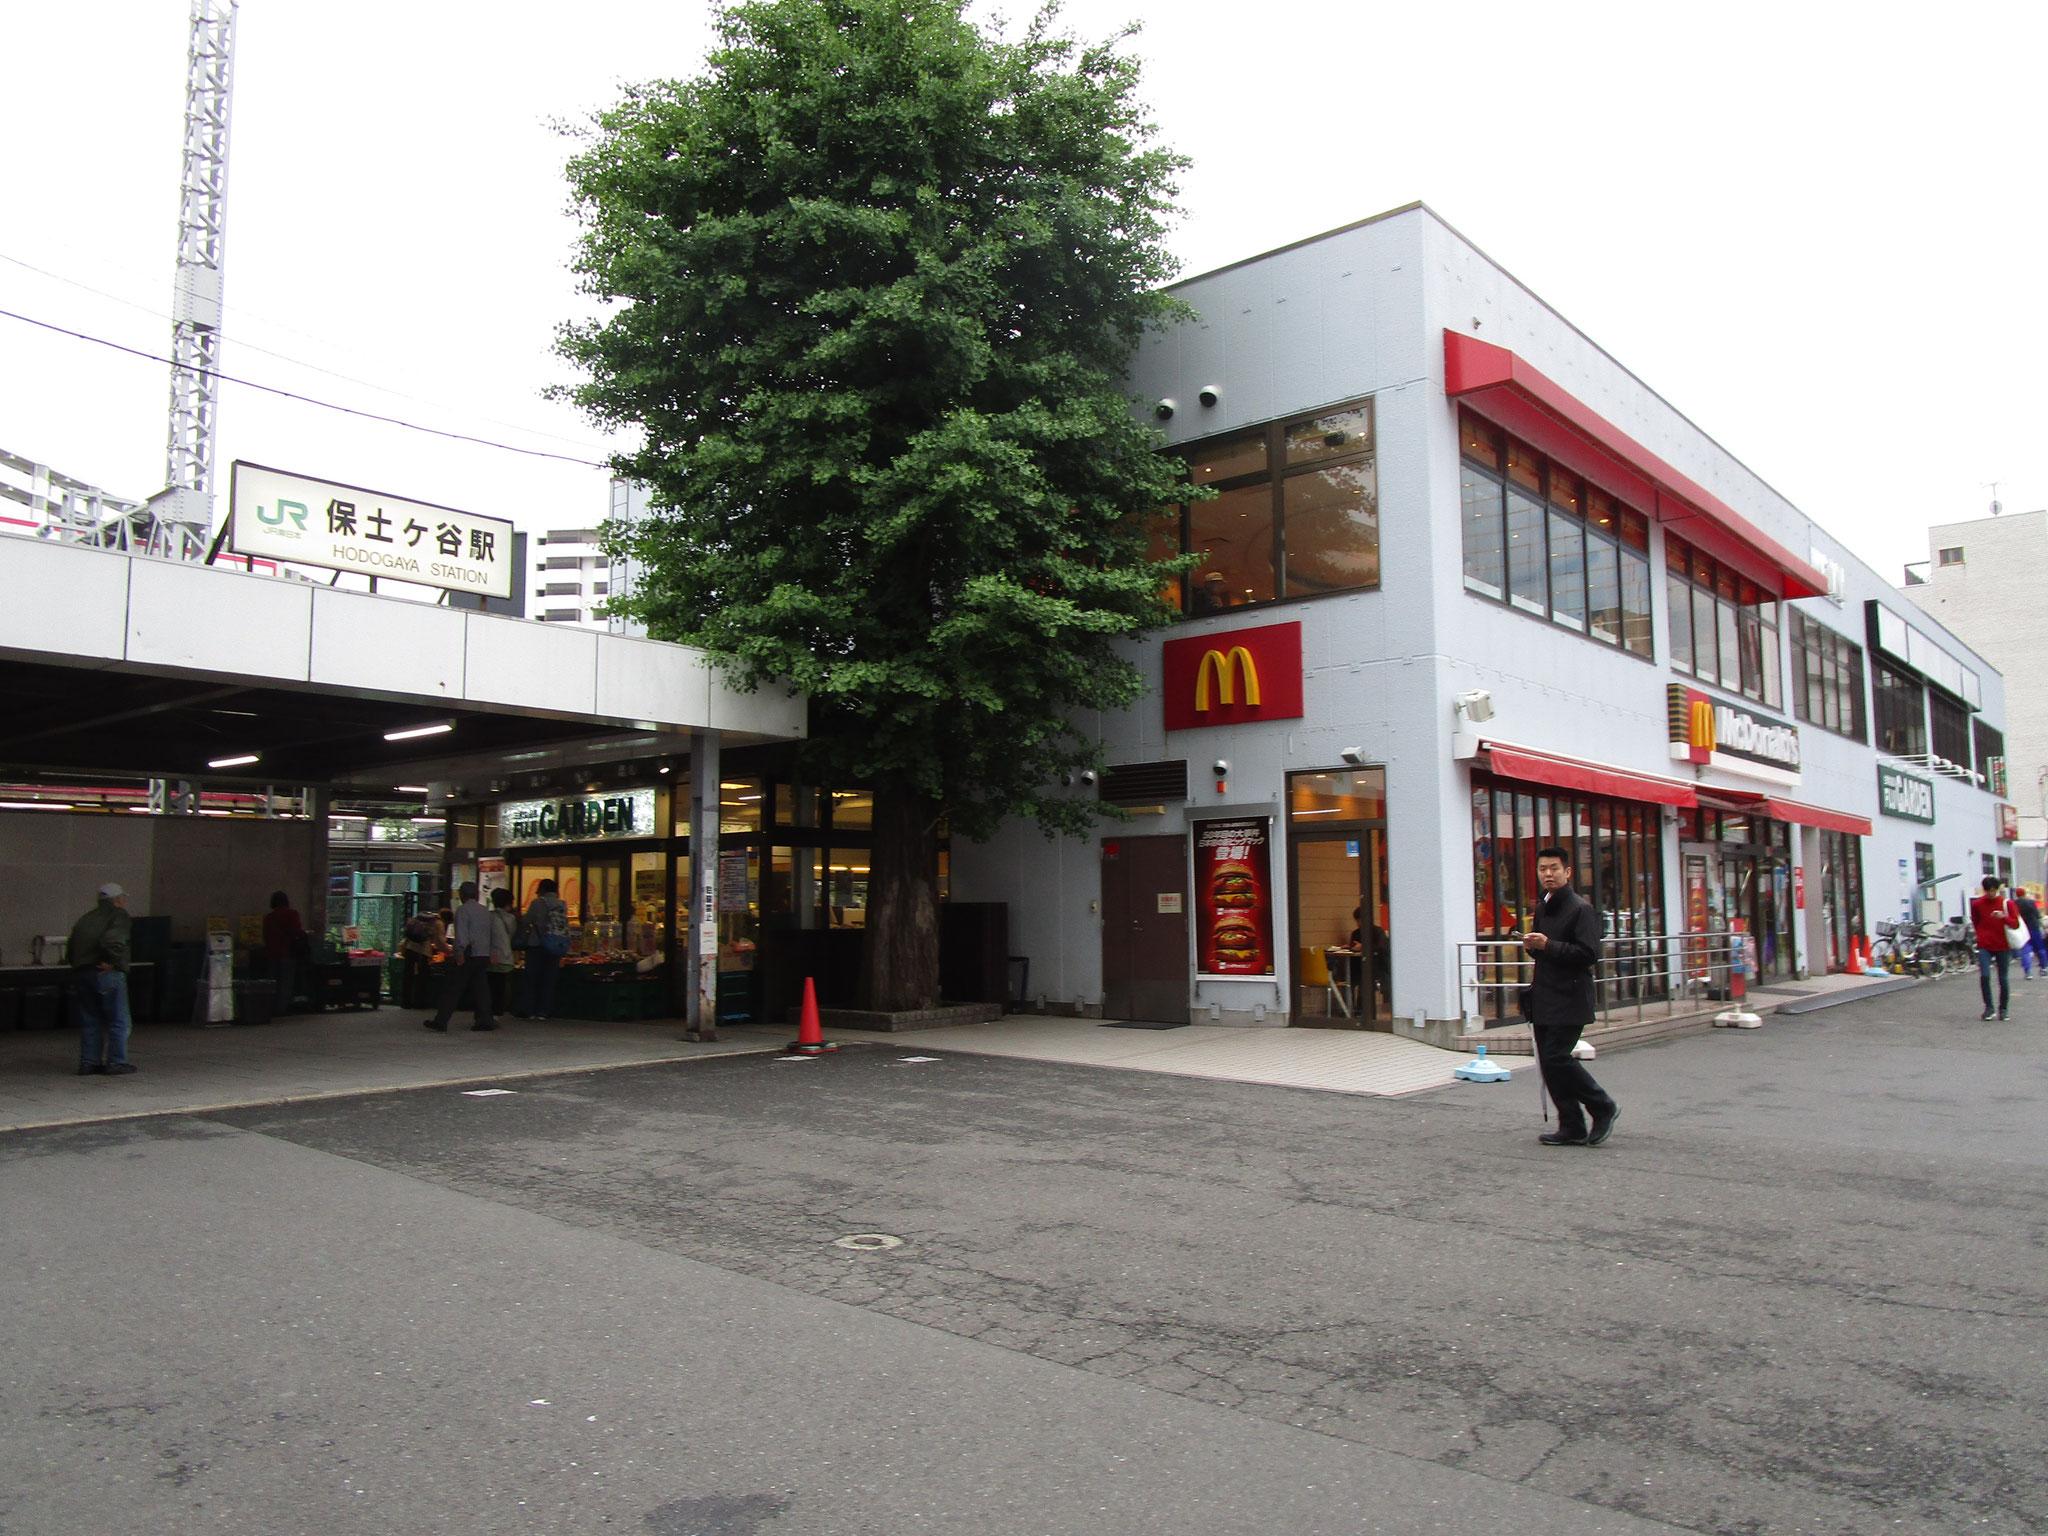 JR保土ヶ谷駅西口駅前